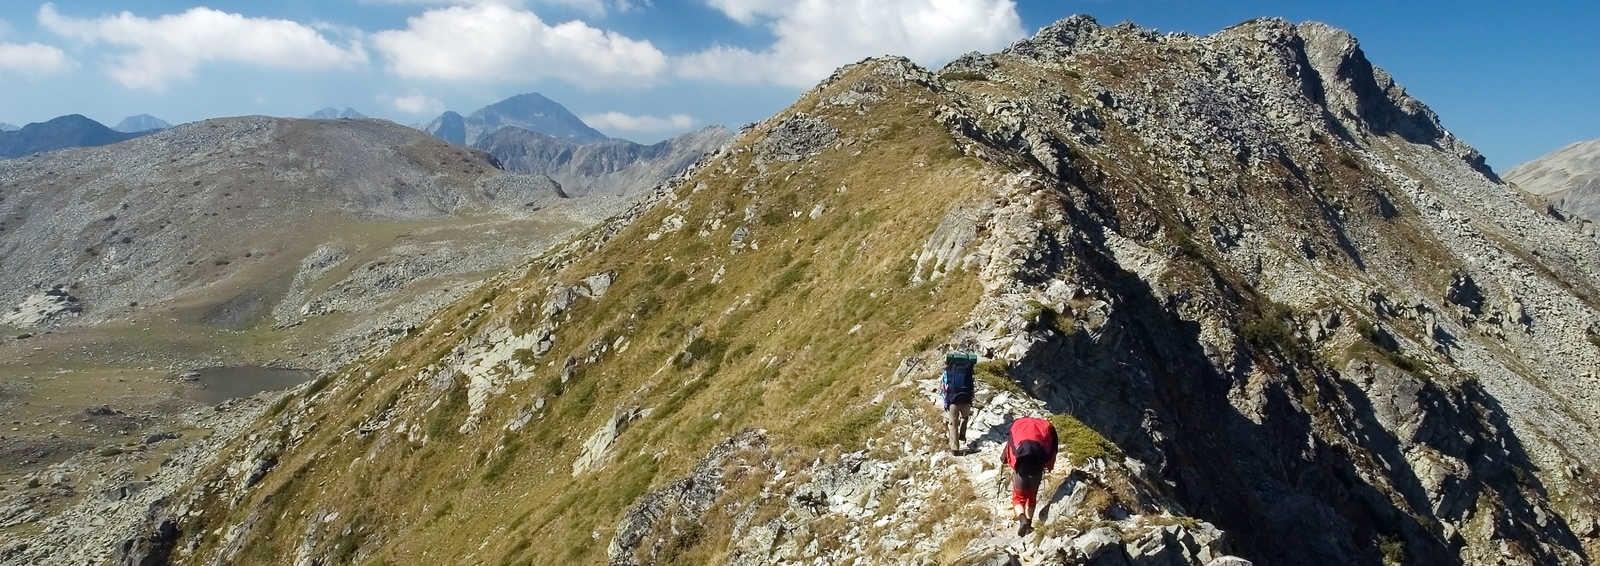 Admiring the scenery in the Rila Mountains, Bulgaria